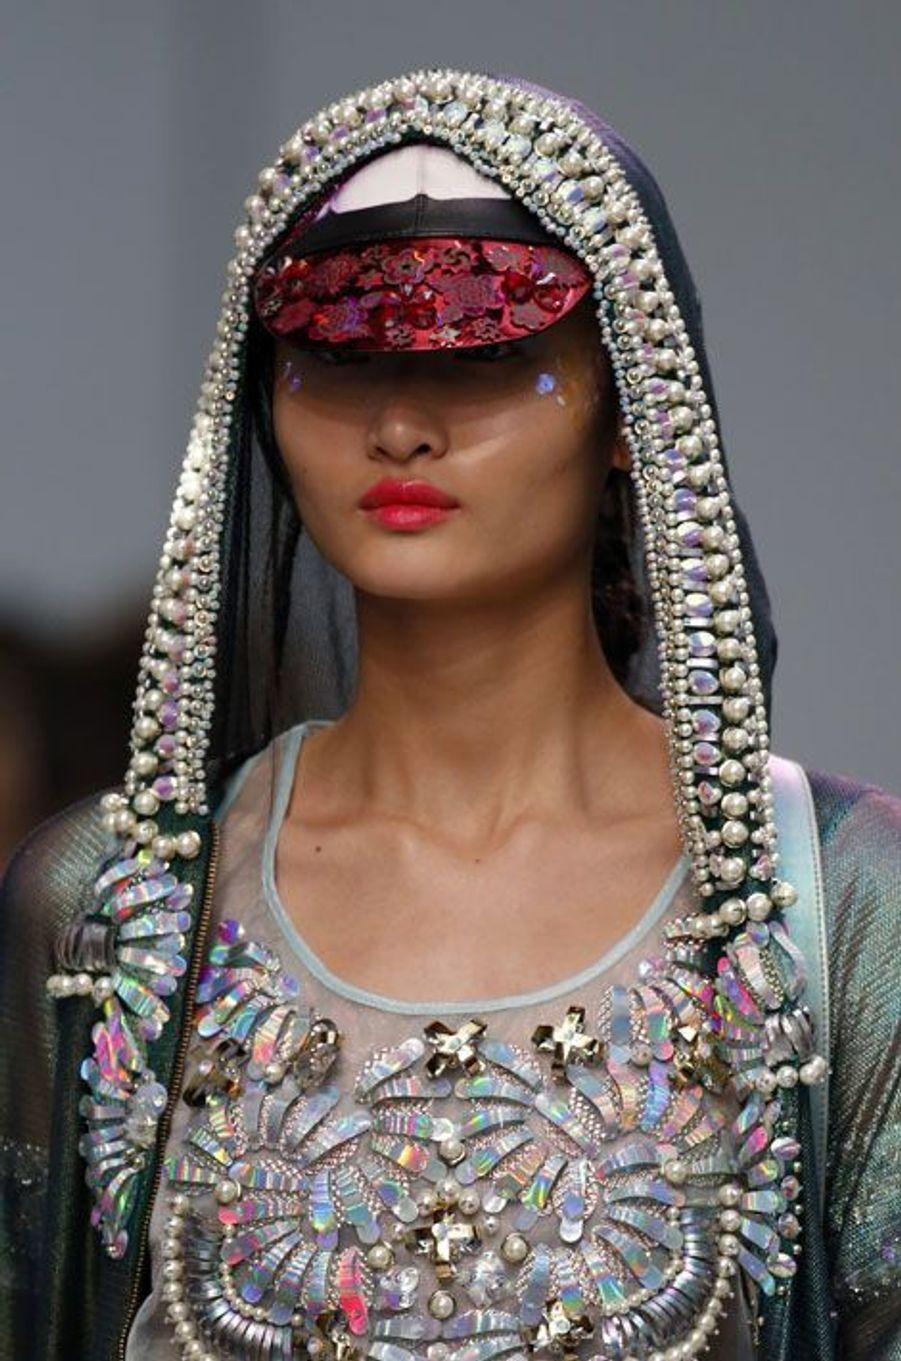 Dans l'oeil de Manish Arora